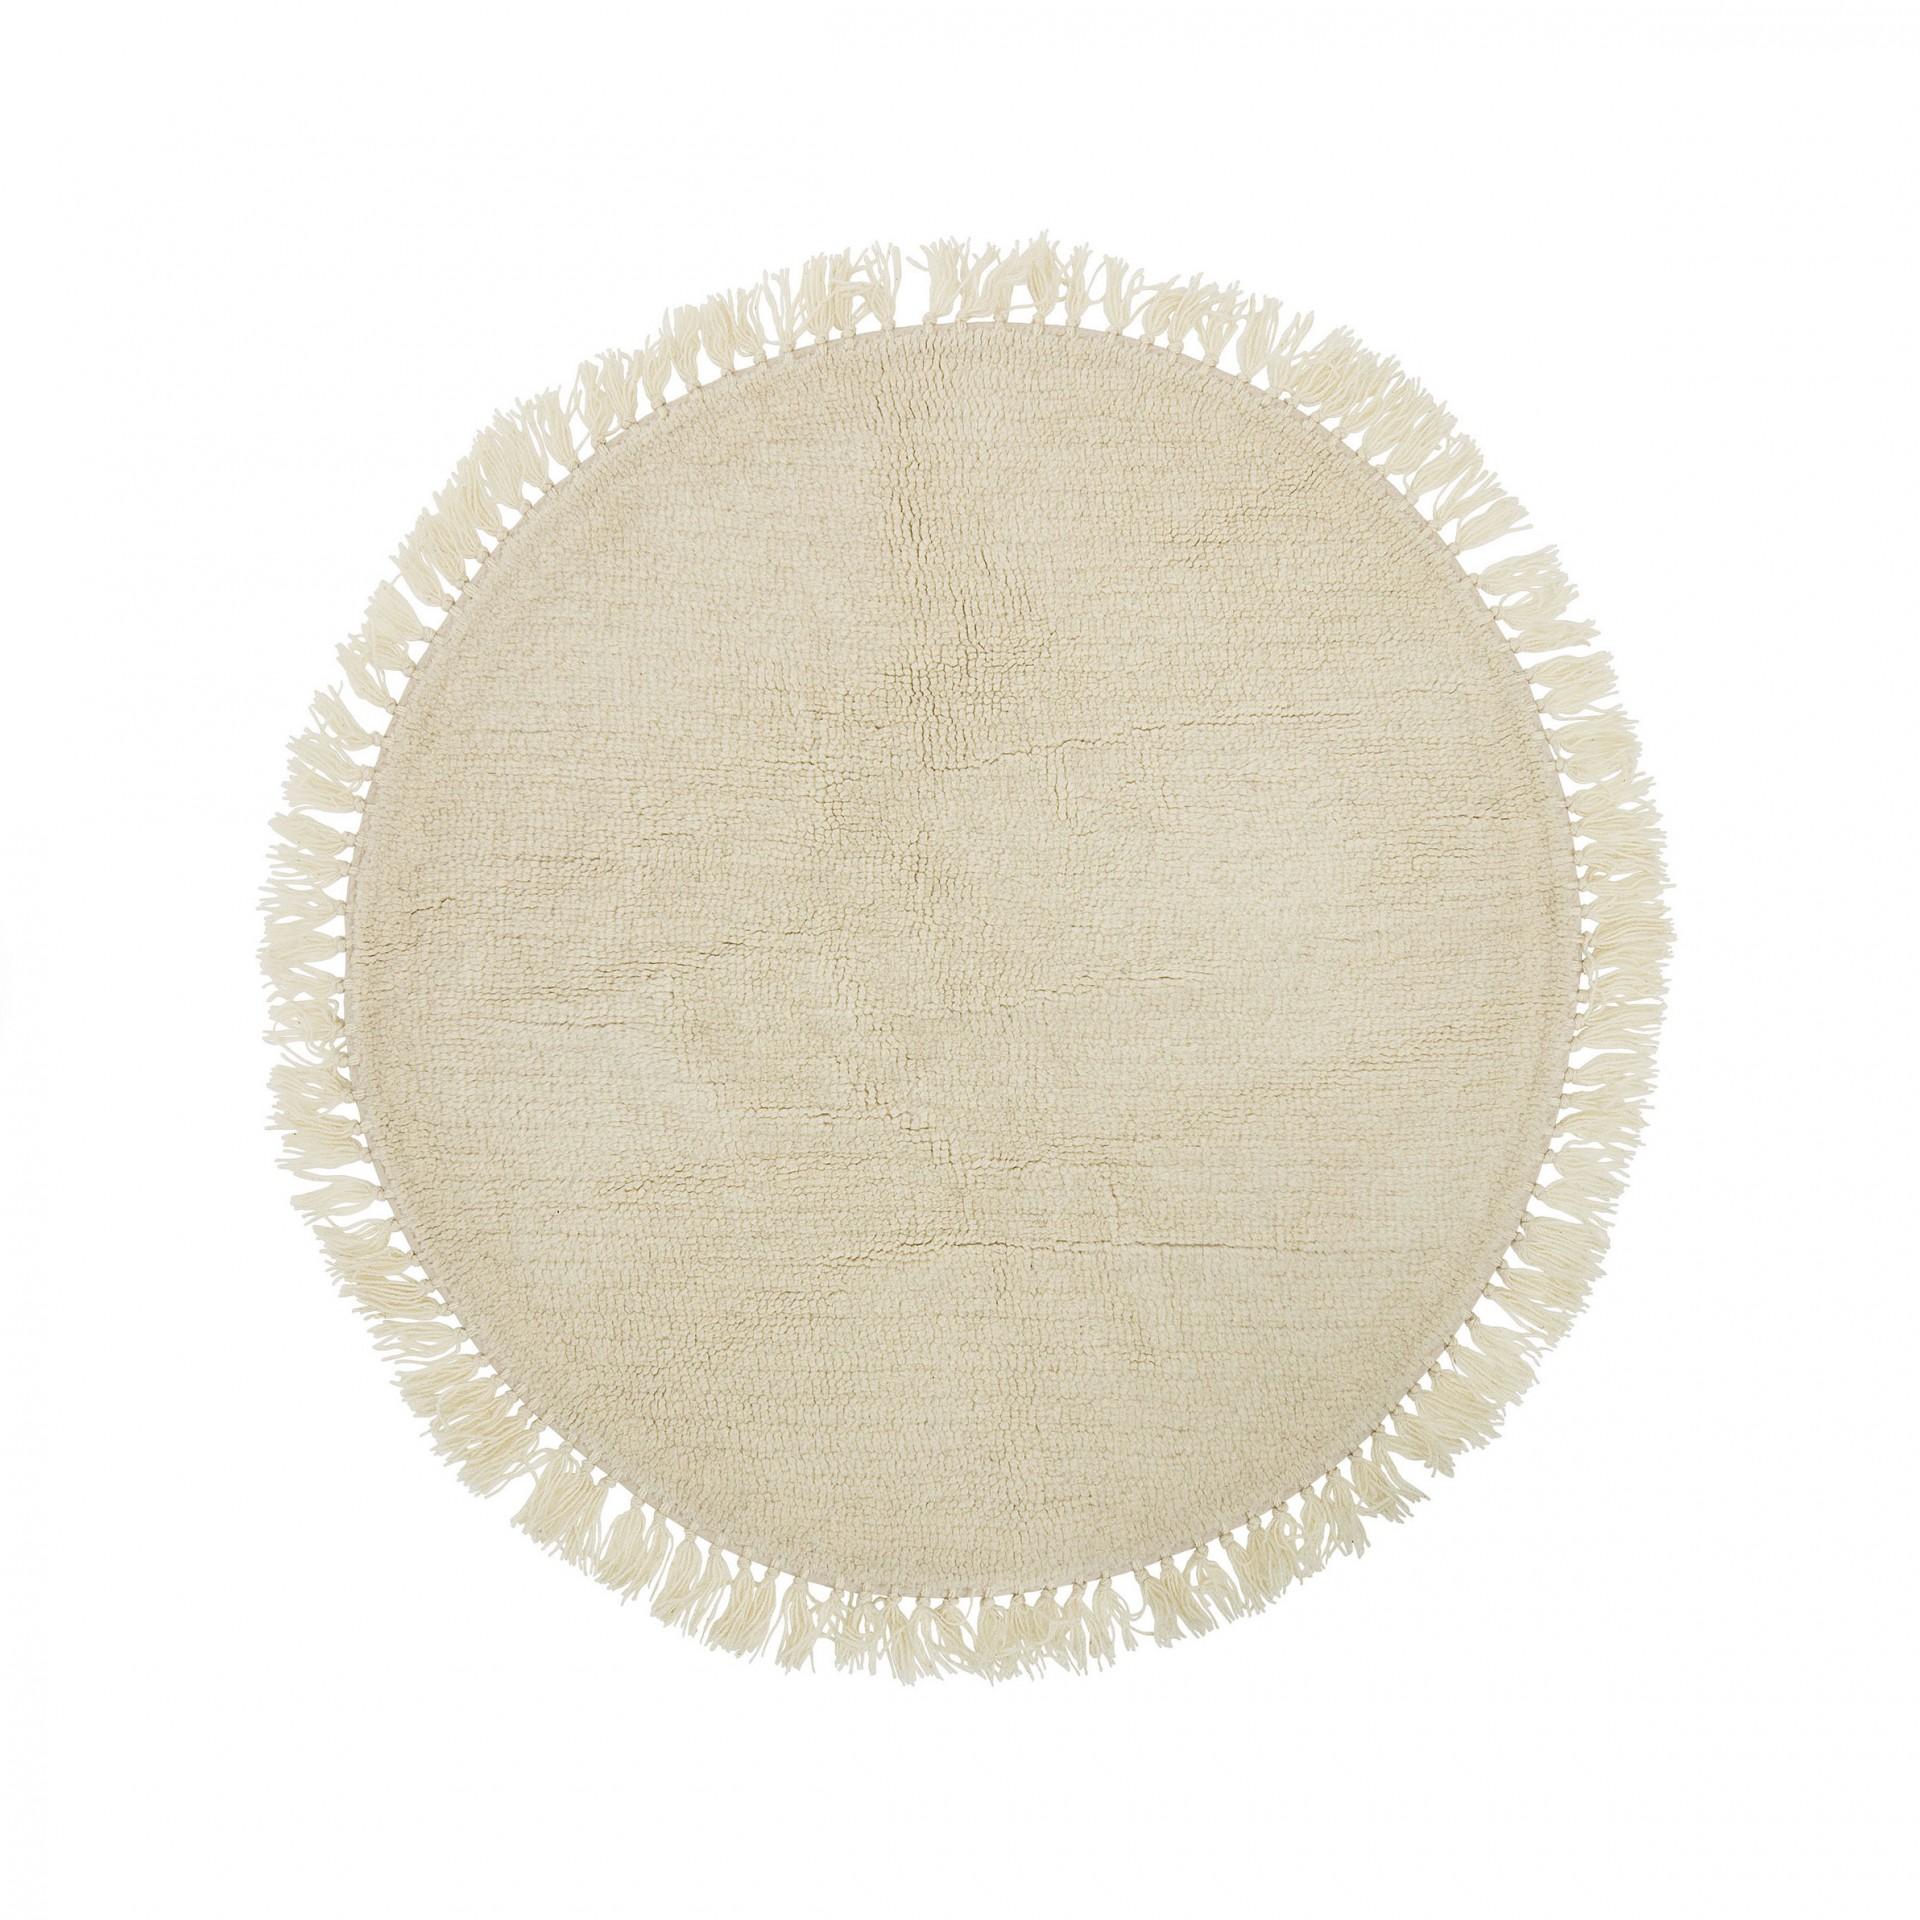 Tapete em lã natural, Ø110 cm